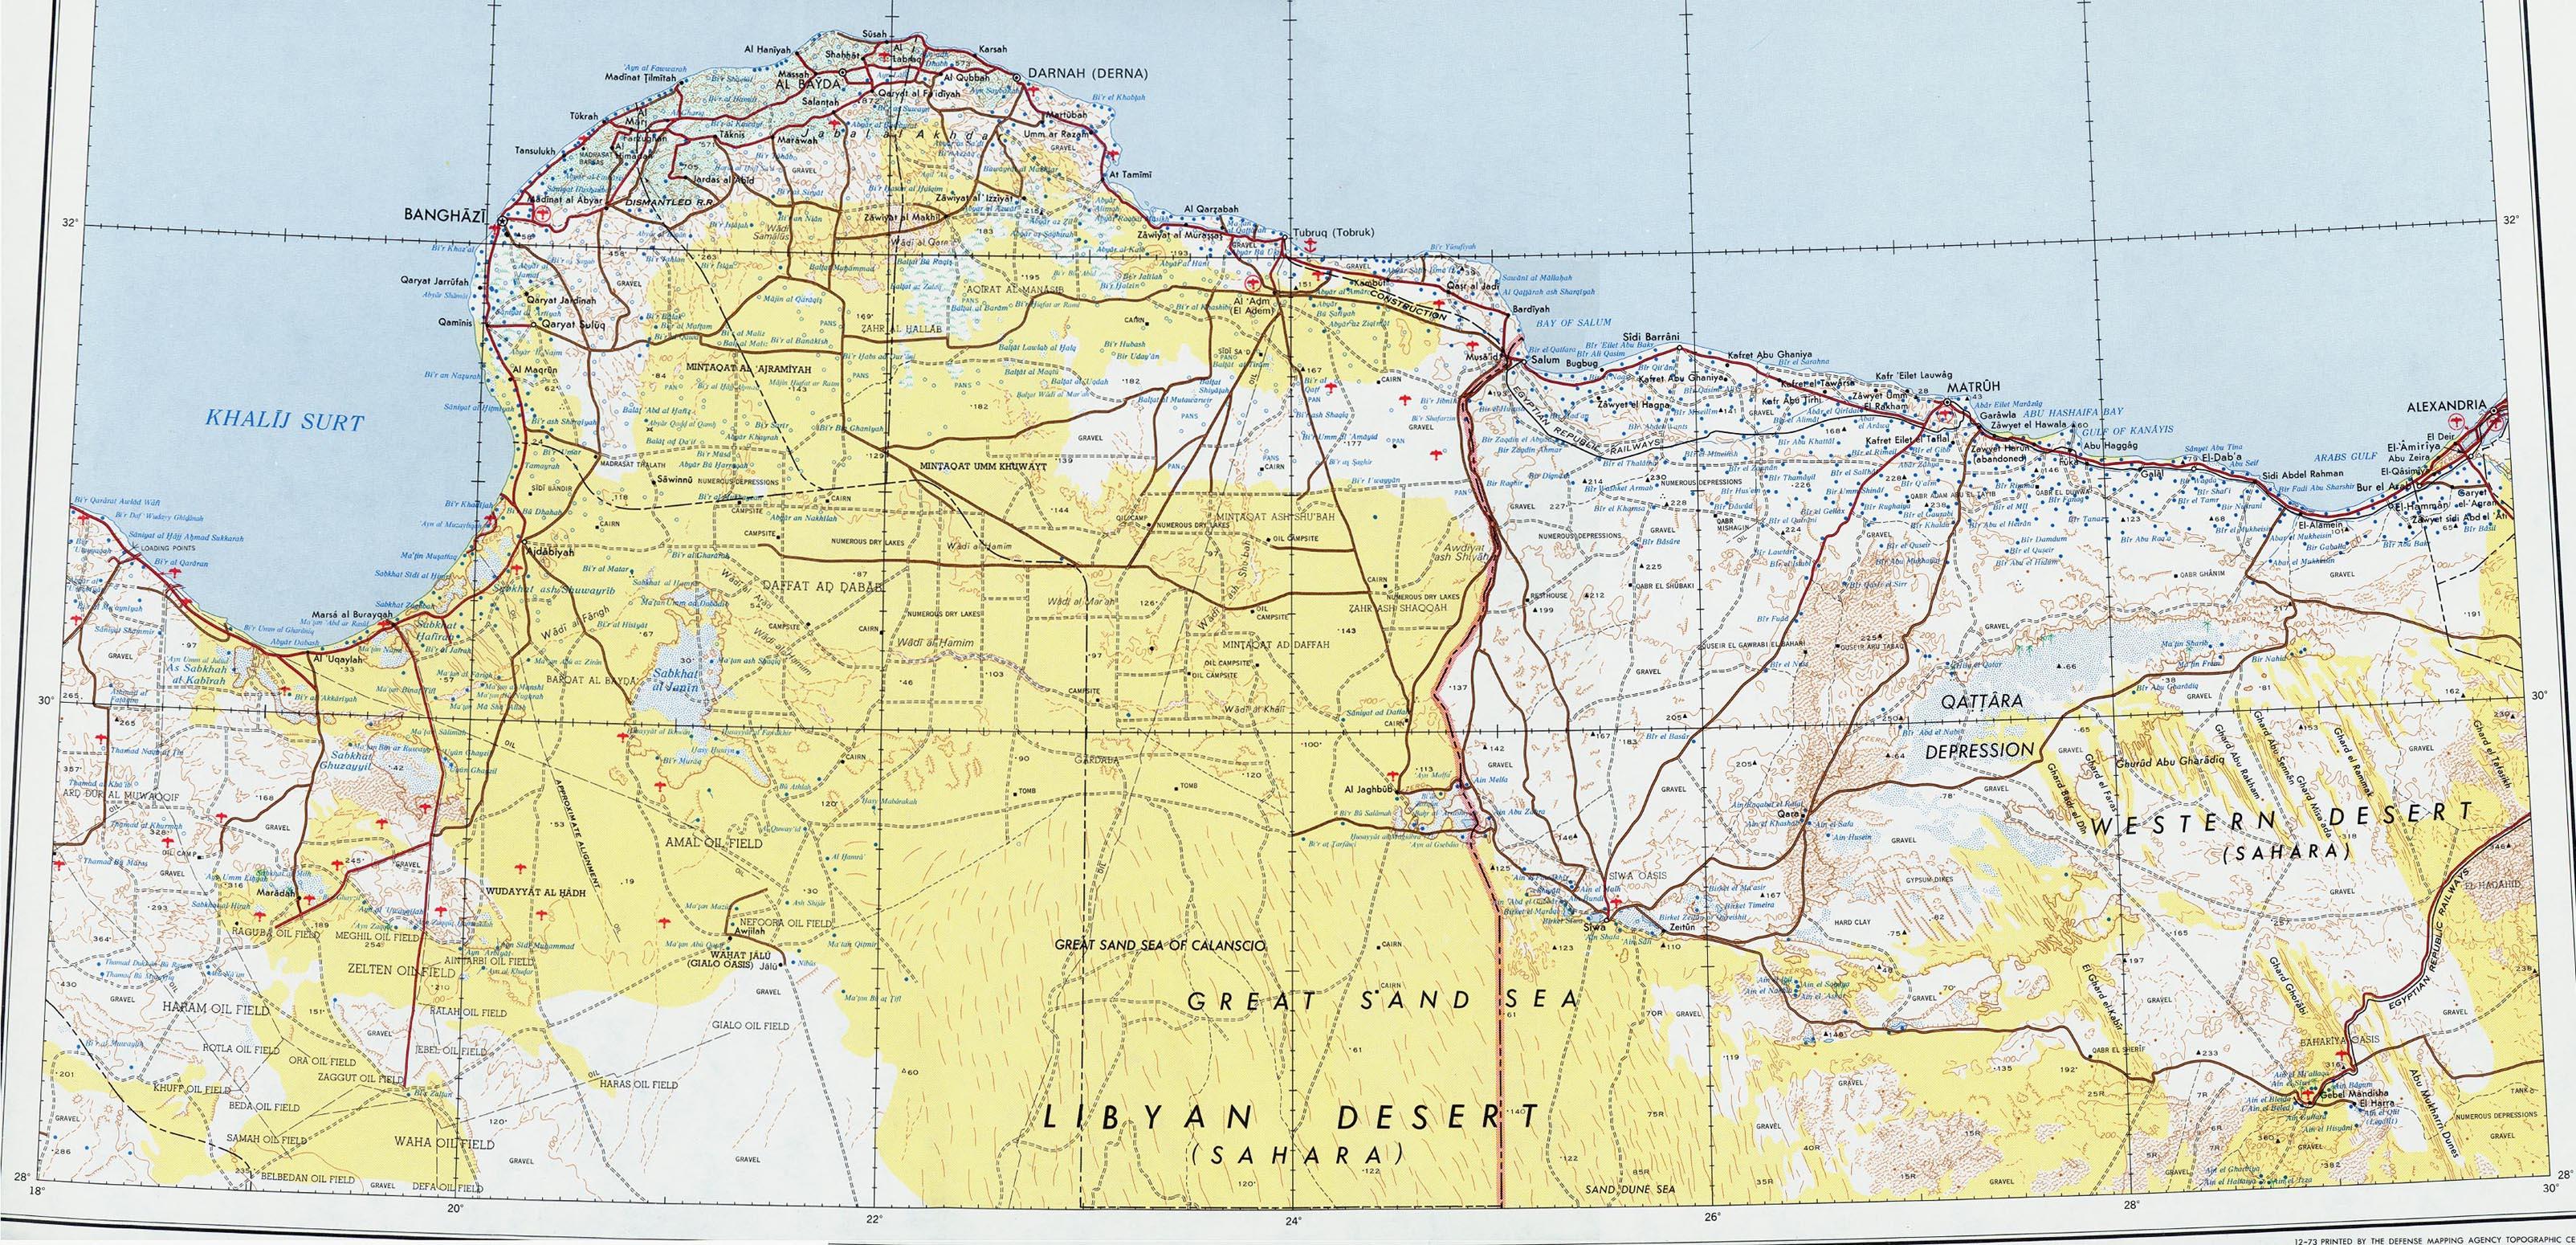 FileBanghazi Area Map US Army Jpg Wikimedia Commons - Map us 1